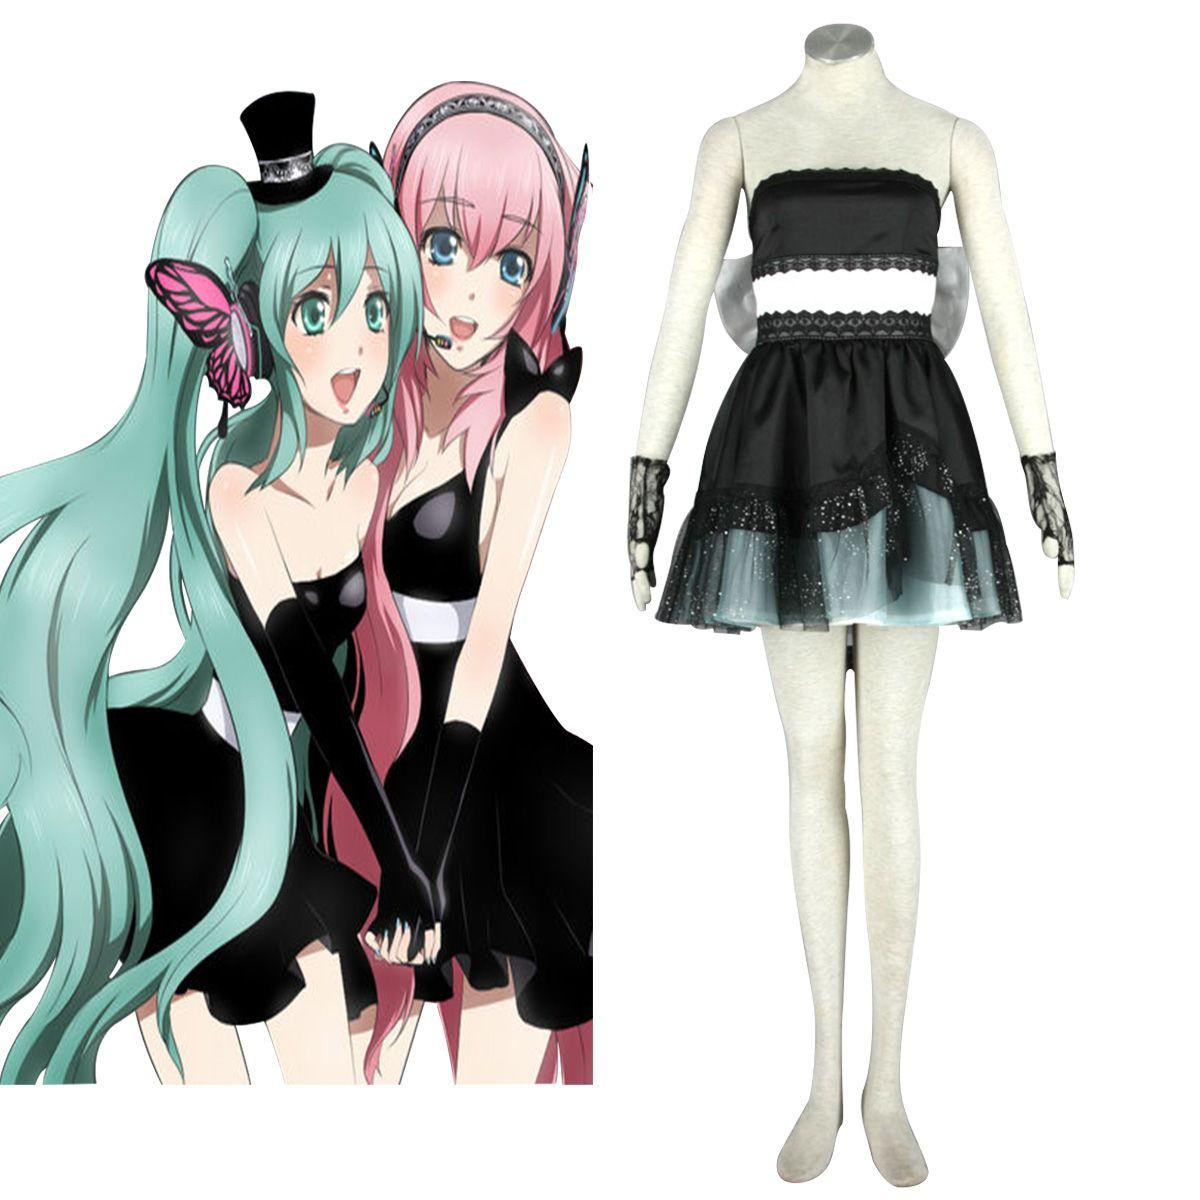 Australia Vocaloid Hatsune Miku 8TH Cosplay CostumesCosplaymade AU ... 66768452e3f8